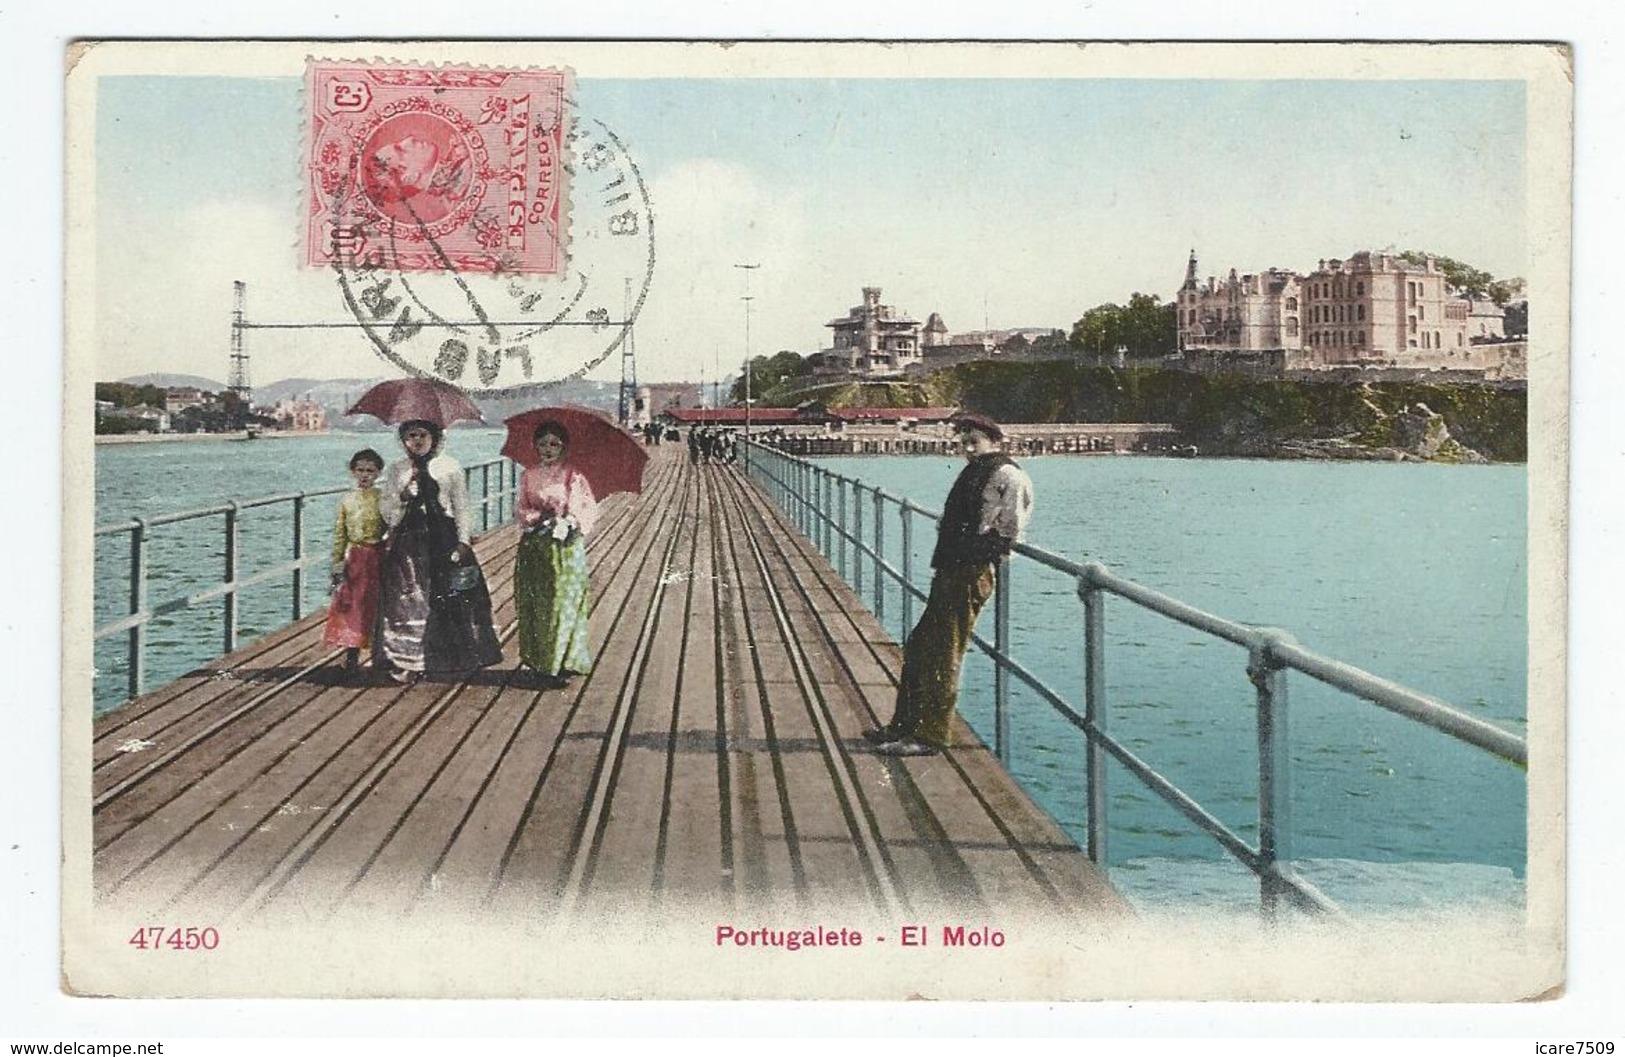 PORTUGALETE (Pays Basque) (Pais Vasco) - El Molo - Espagne